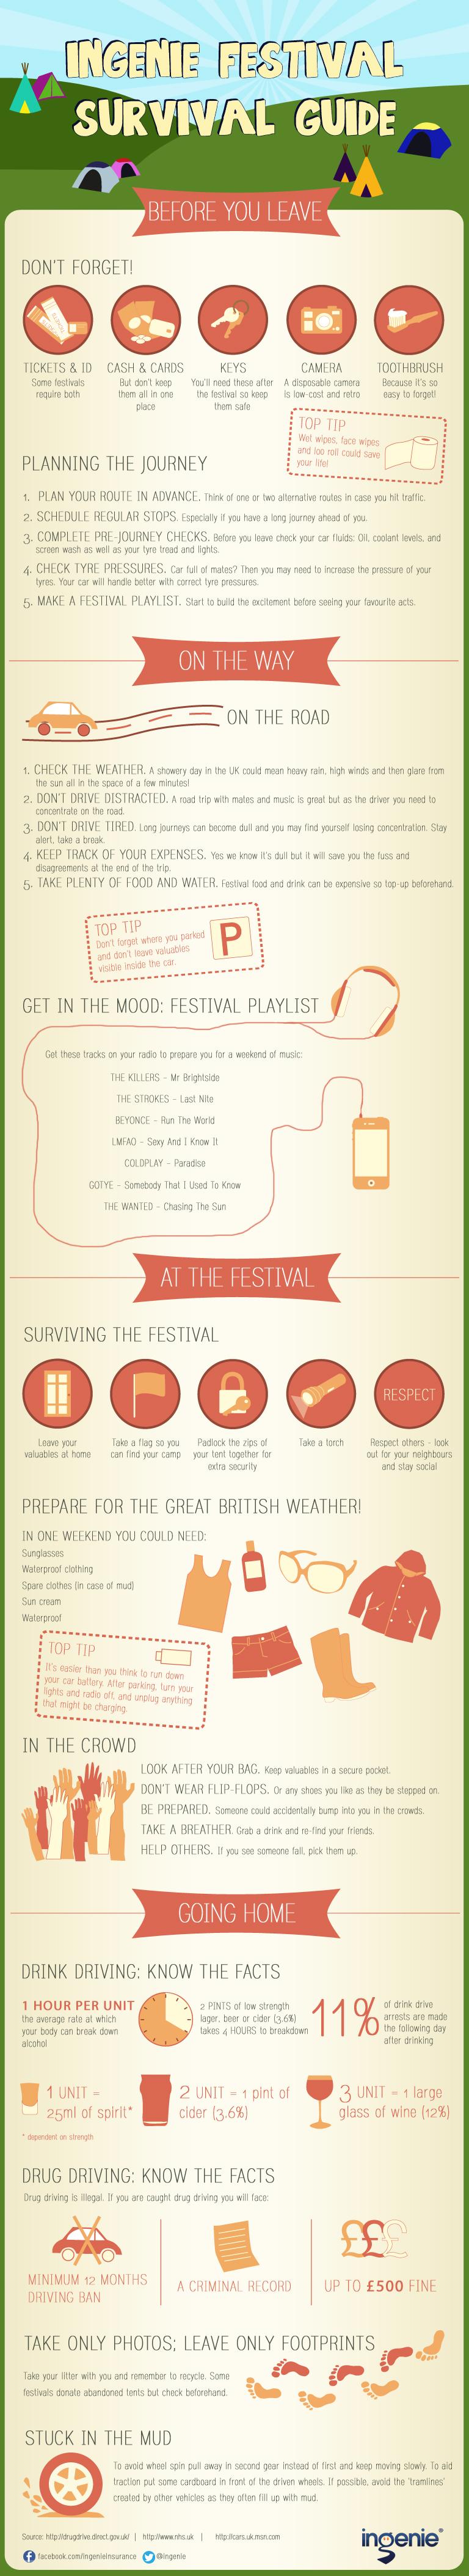 ingenie Festival Survival Guide